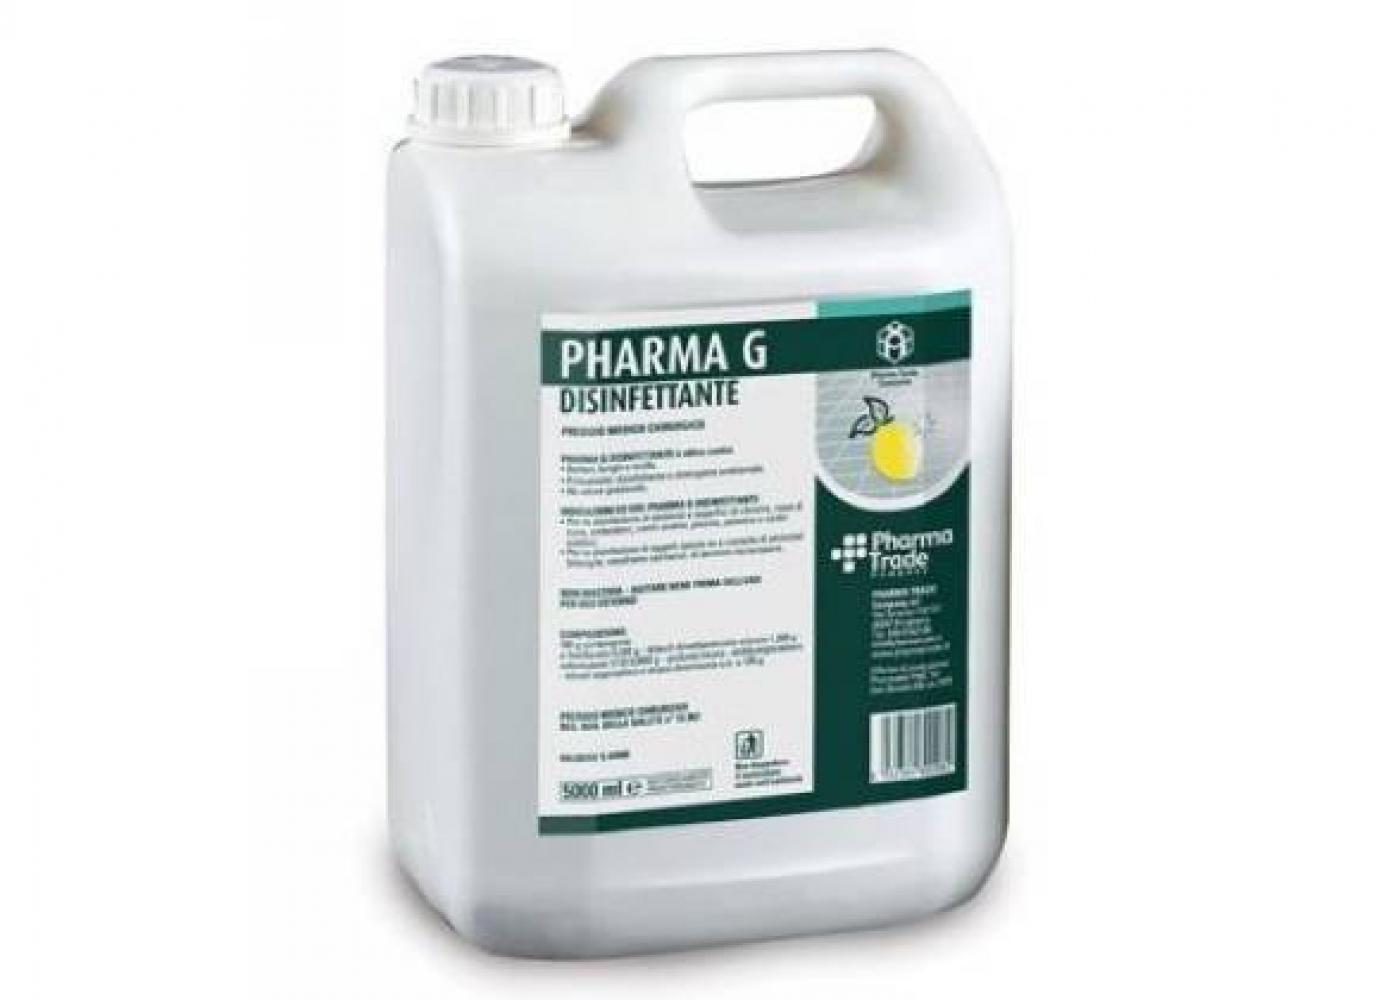 Acquista Pharma Disinfettante Detergente 17545713 | Glooke.com